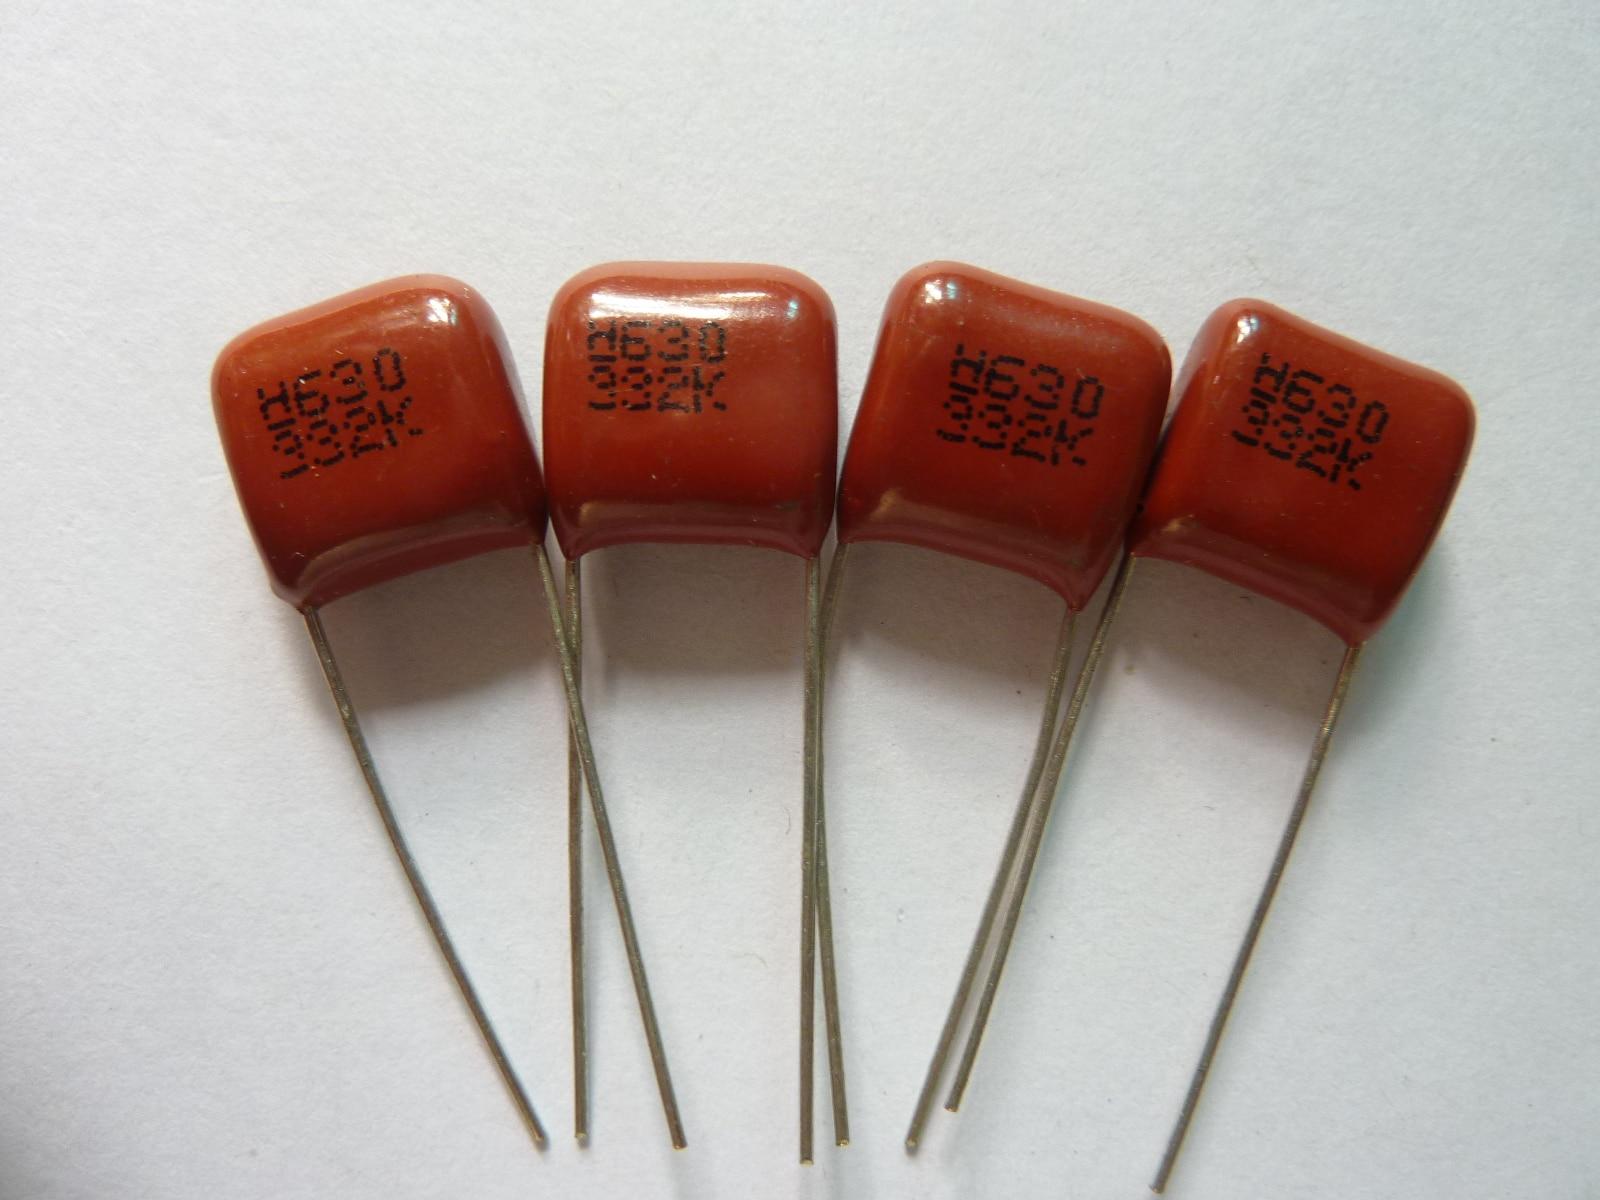 50PCS CBB 104J 630V CBB21 0.1UF 100NF P10 Metallized Film Capacitor